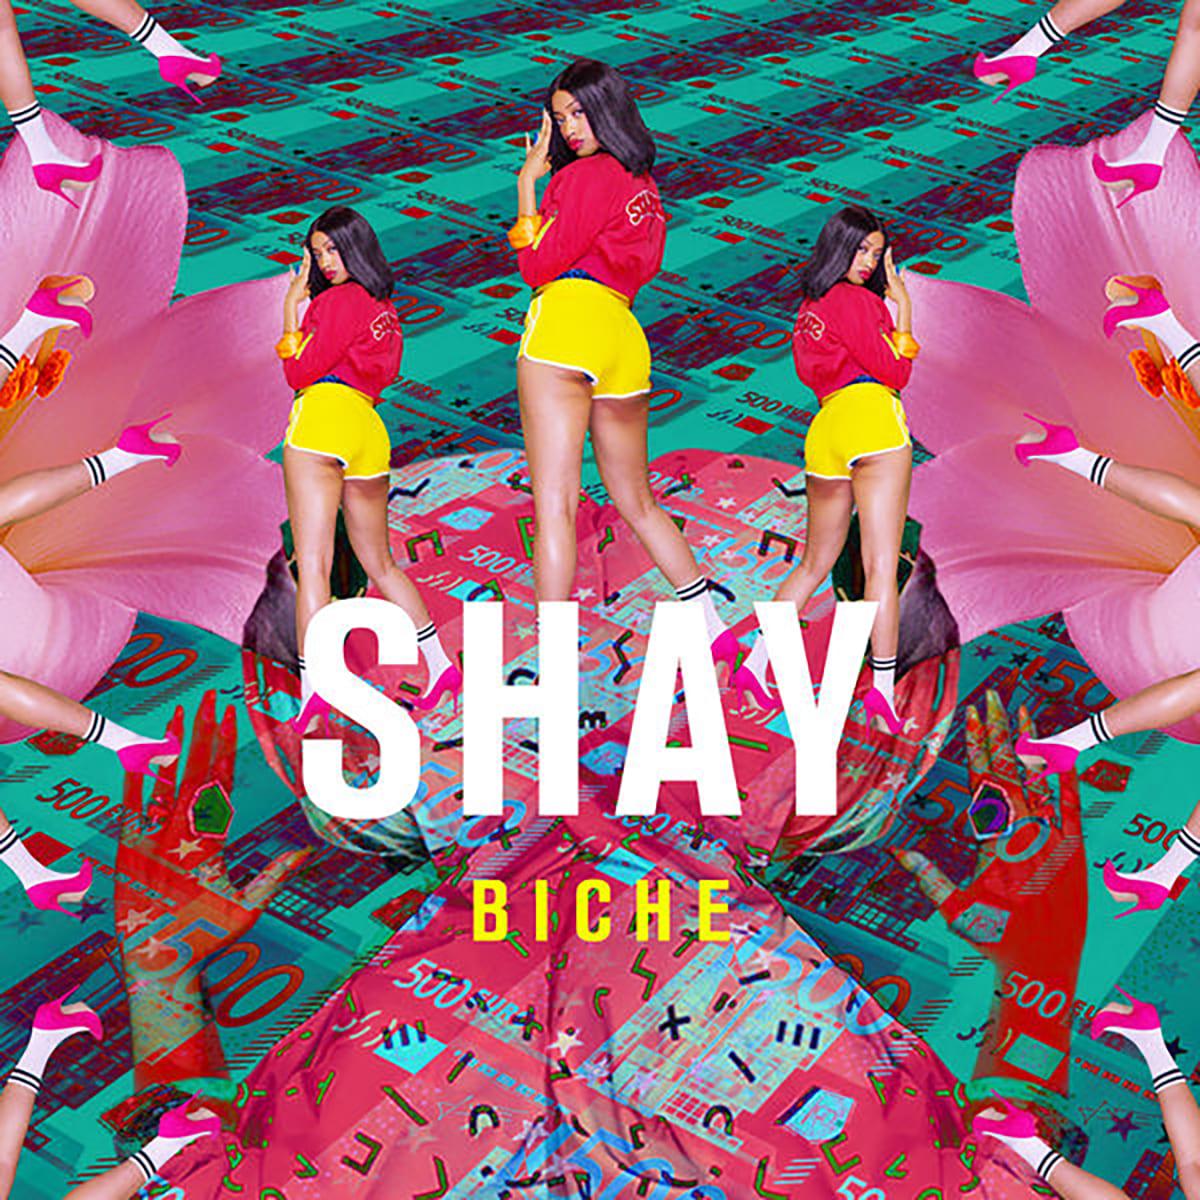 fla_shay_biche_1